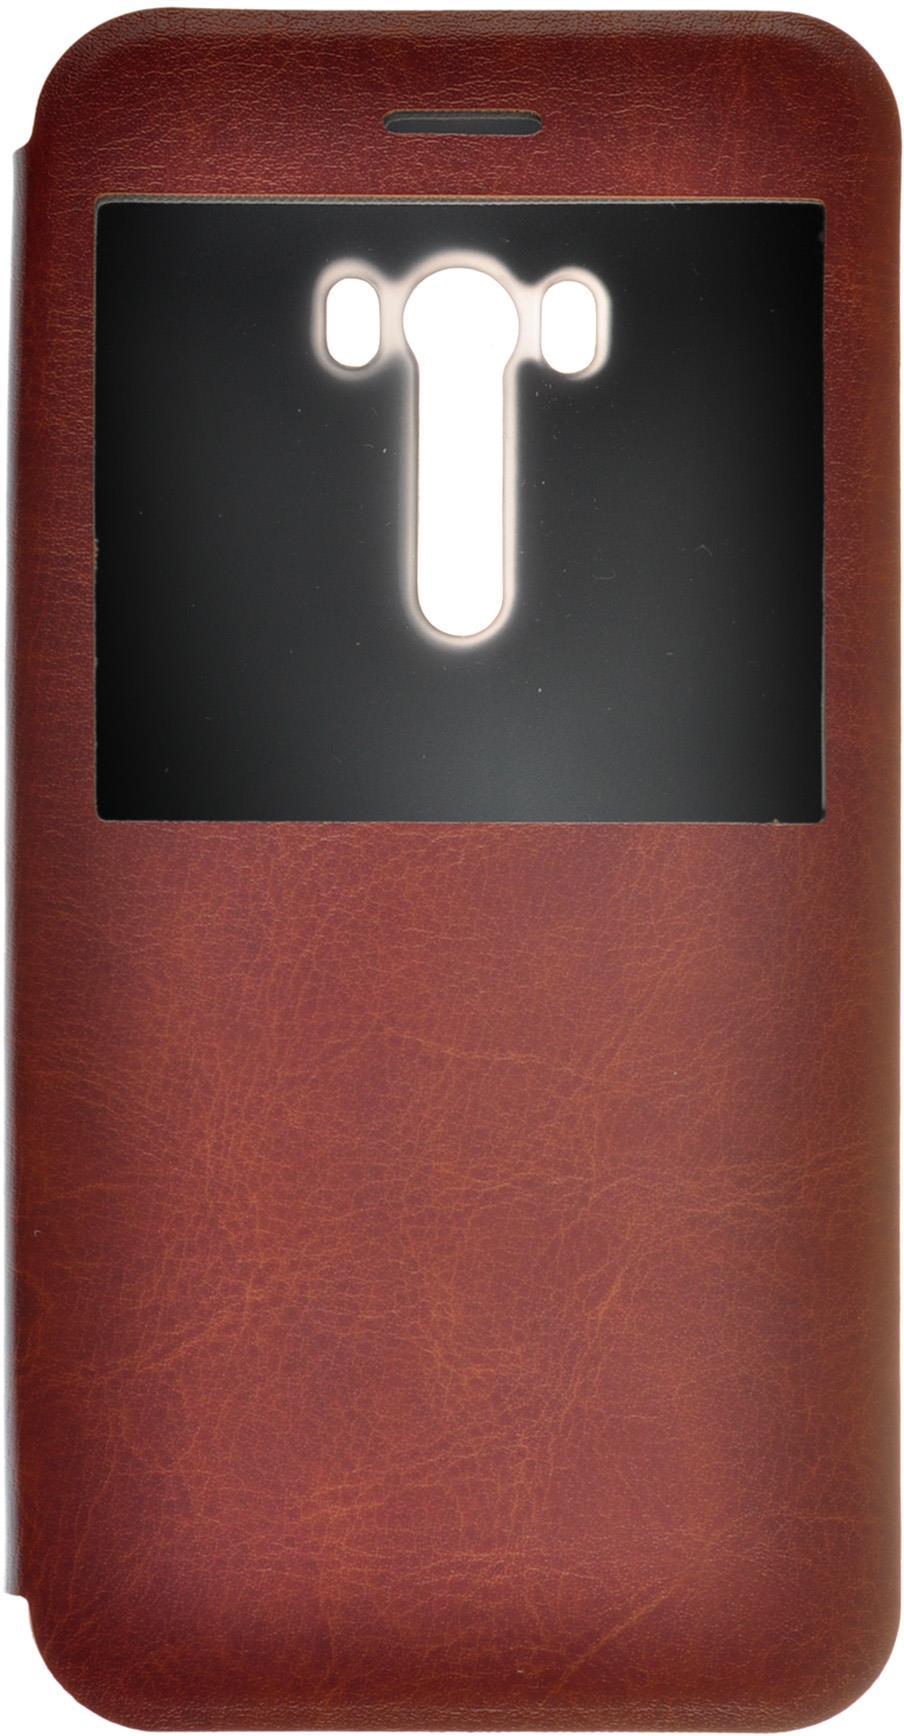 SkinBox Lux Asus Zenfone Selfie ZD551KL AW T-S-AZZD551KL-003